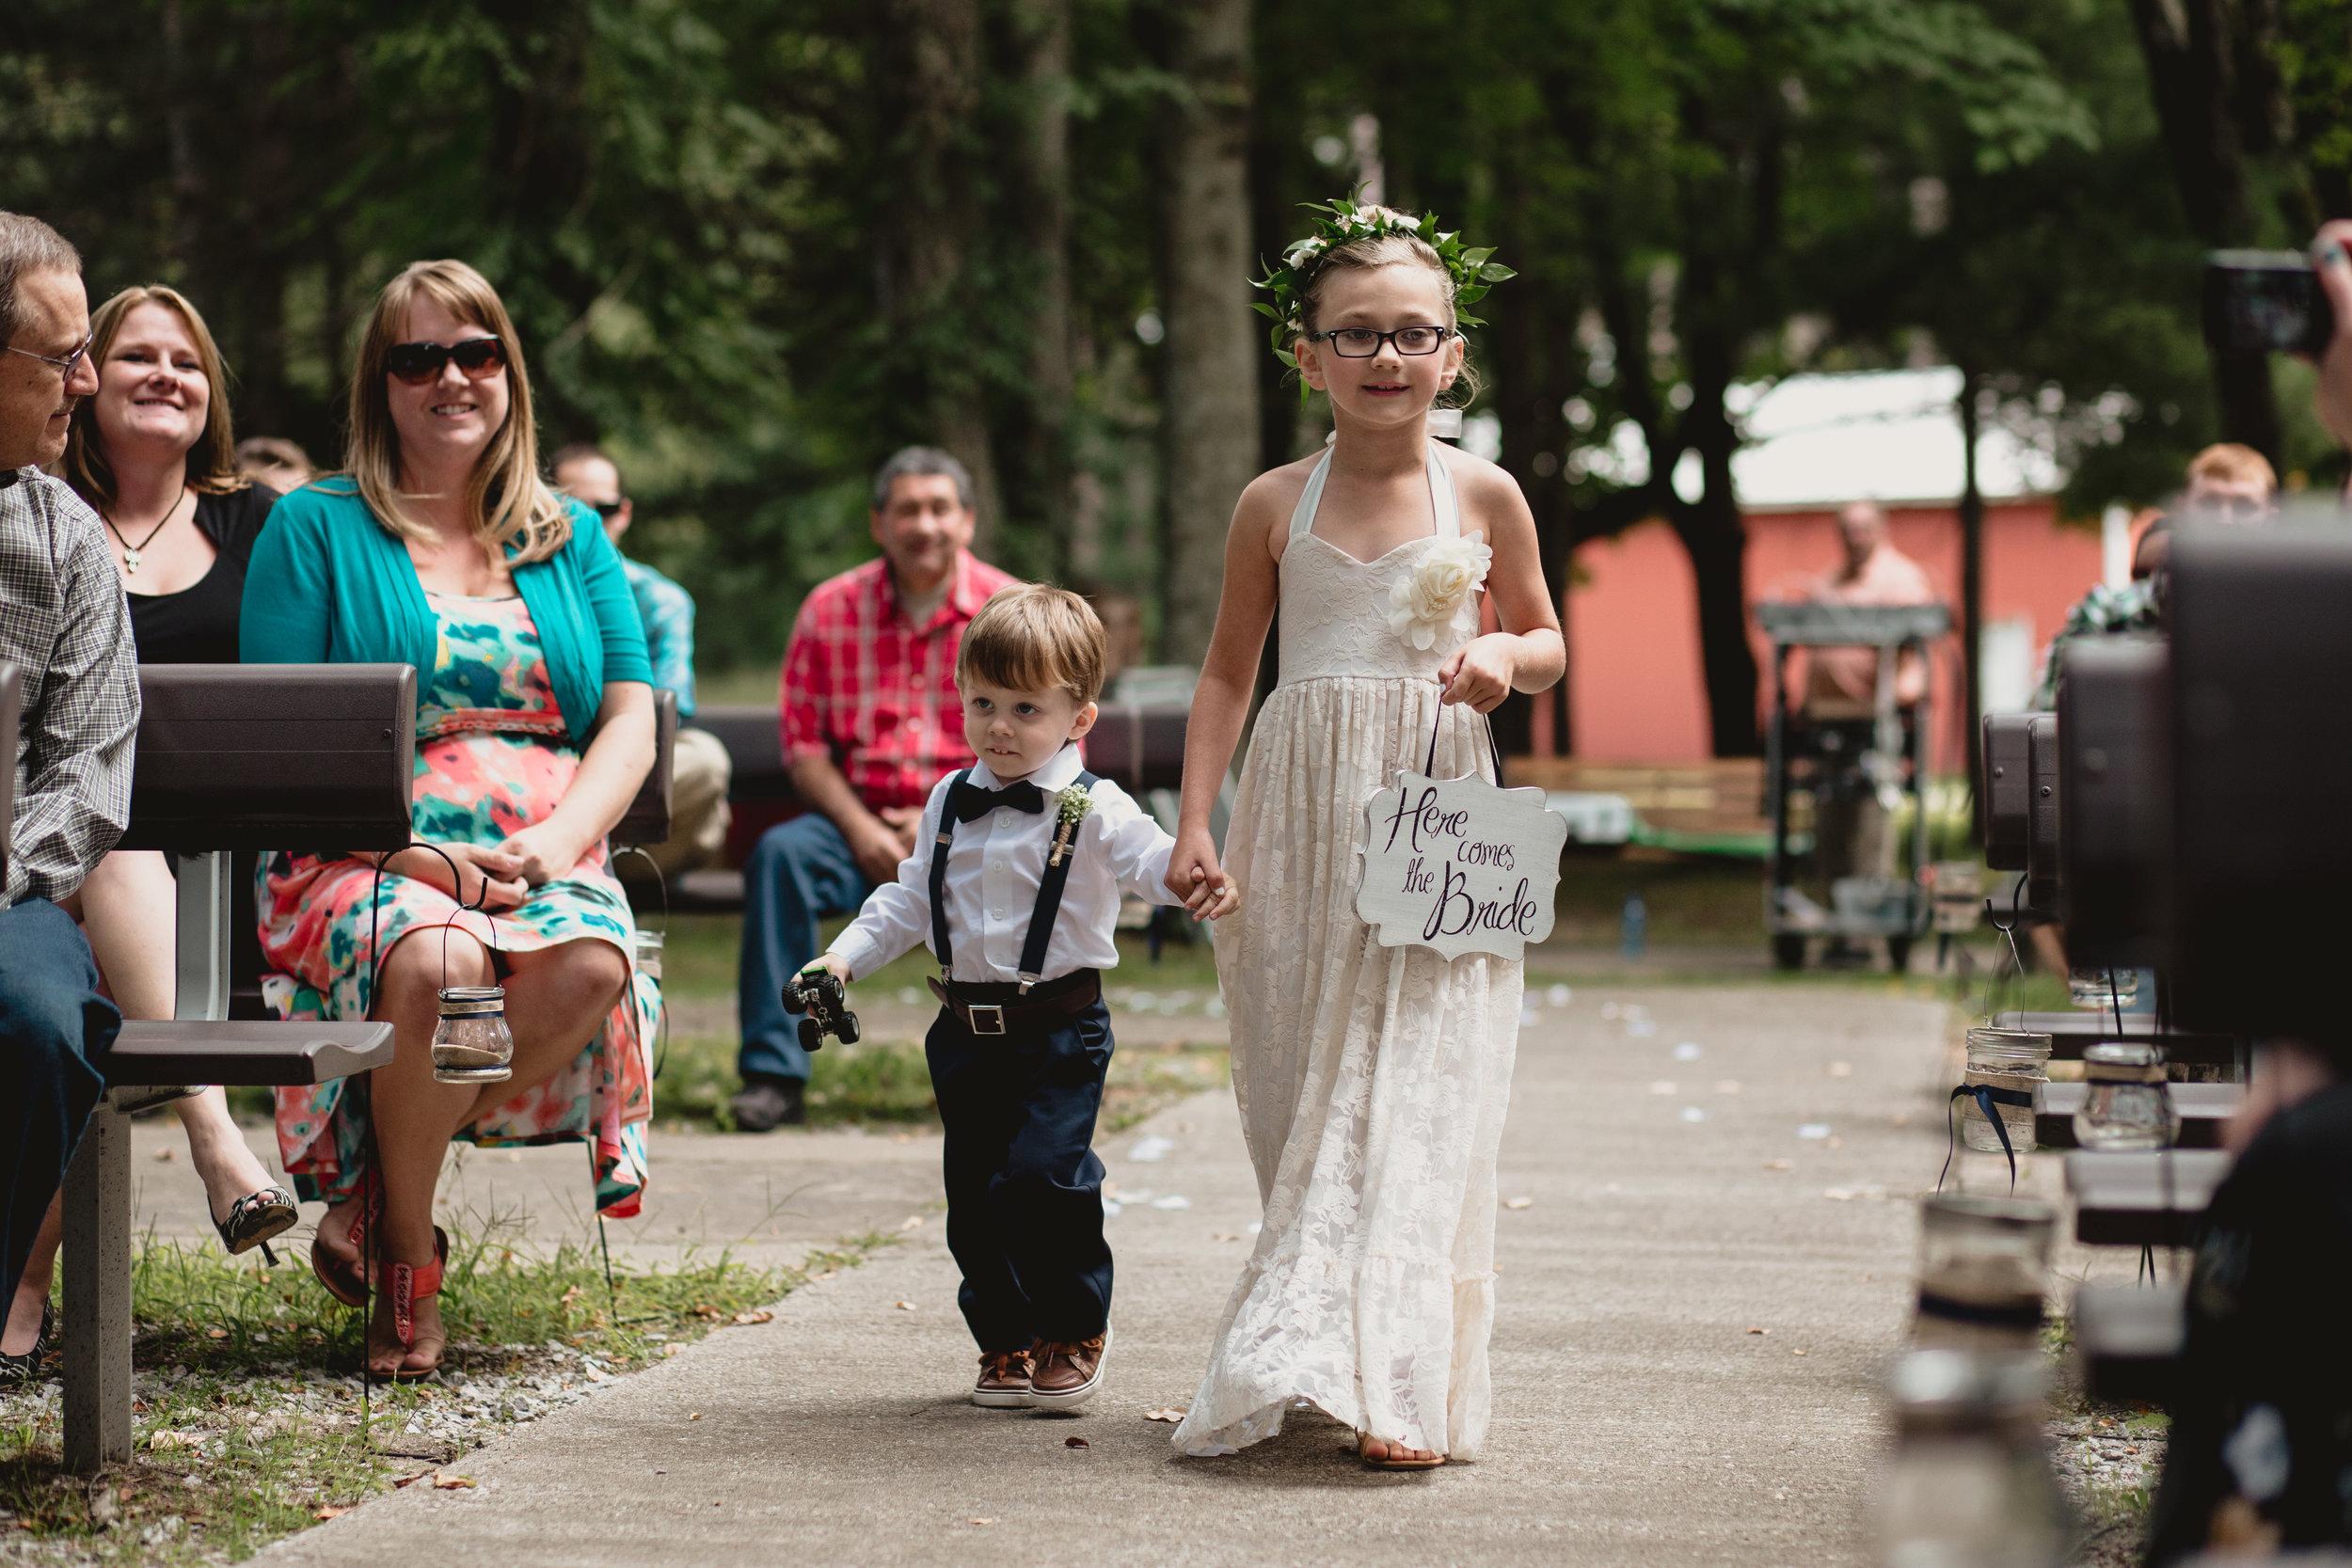 west-michigan-wedding-photographer-whitehall-rachel-austin-chapel-in-the-pines-239.jpg